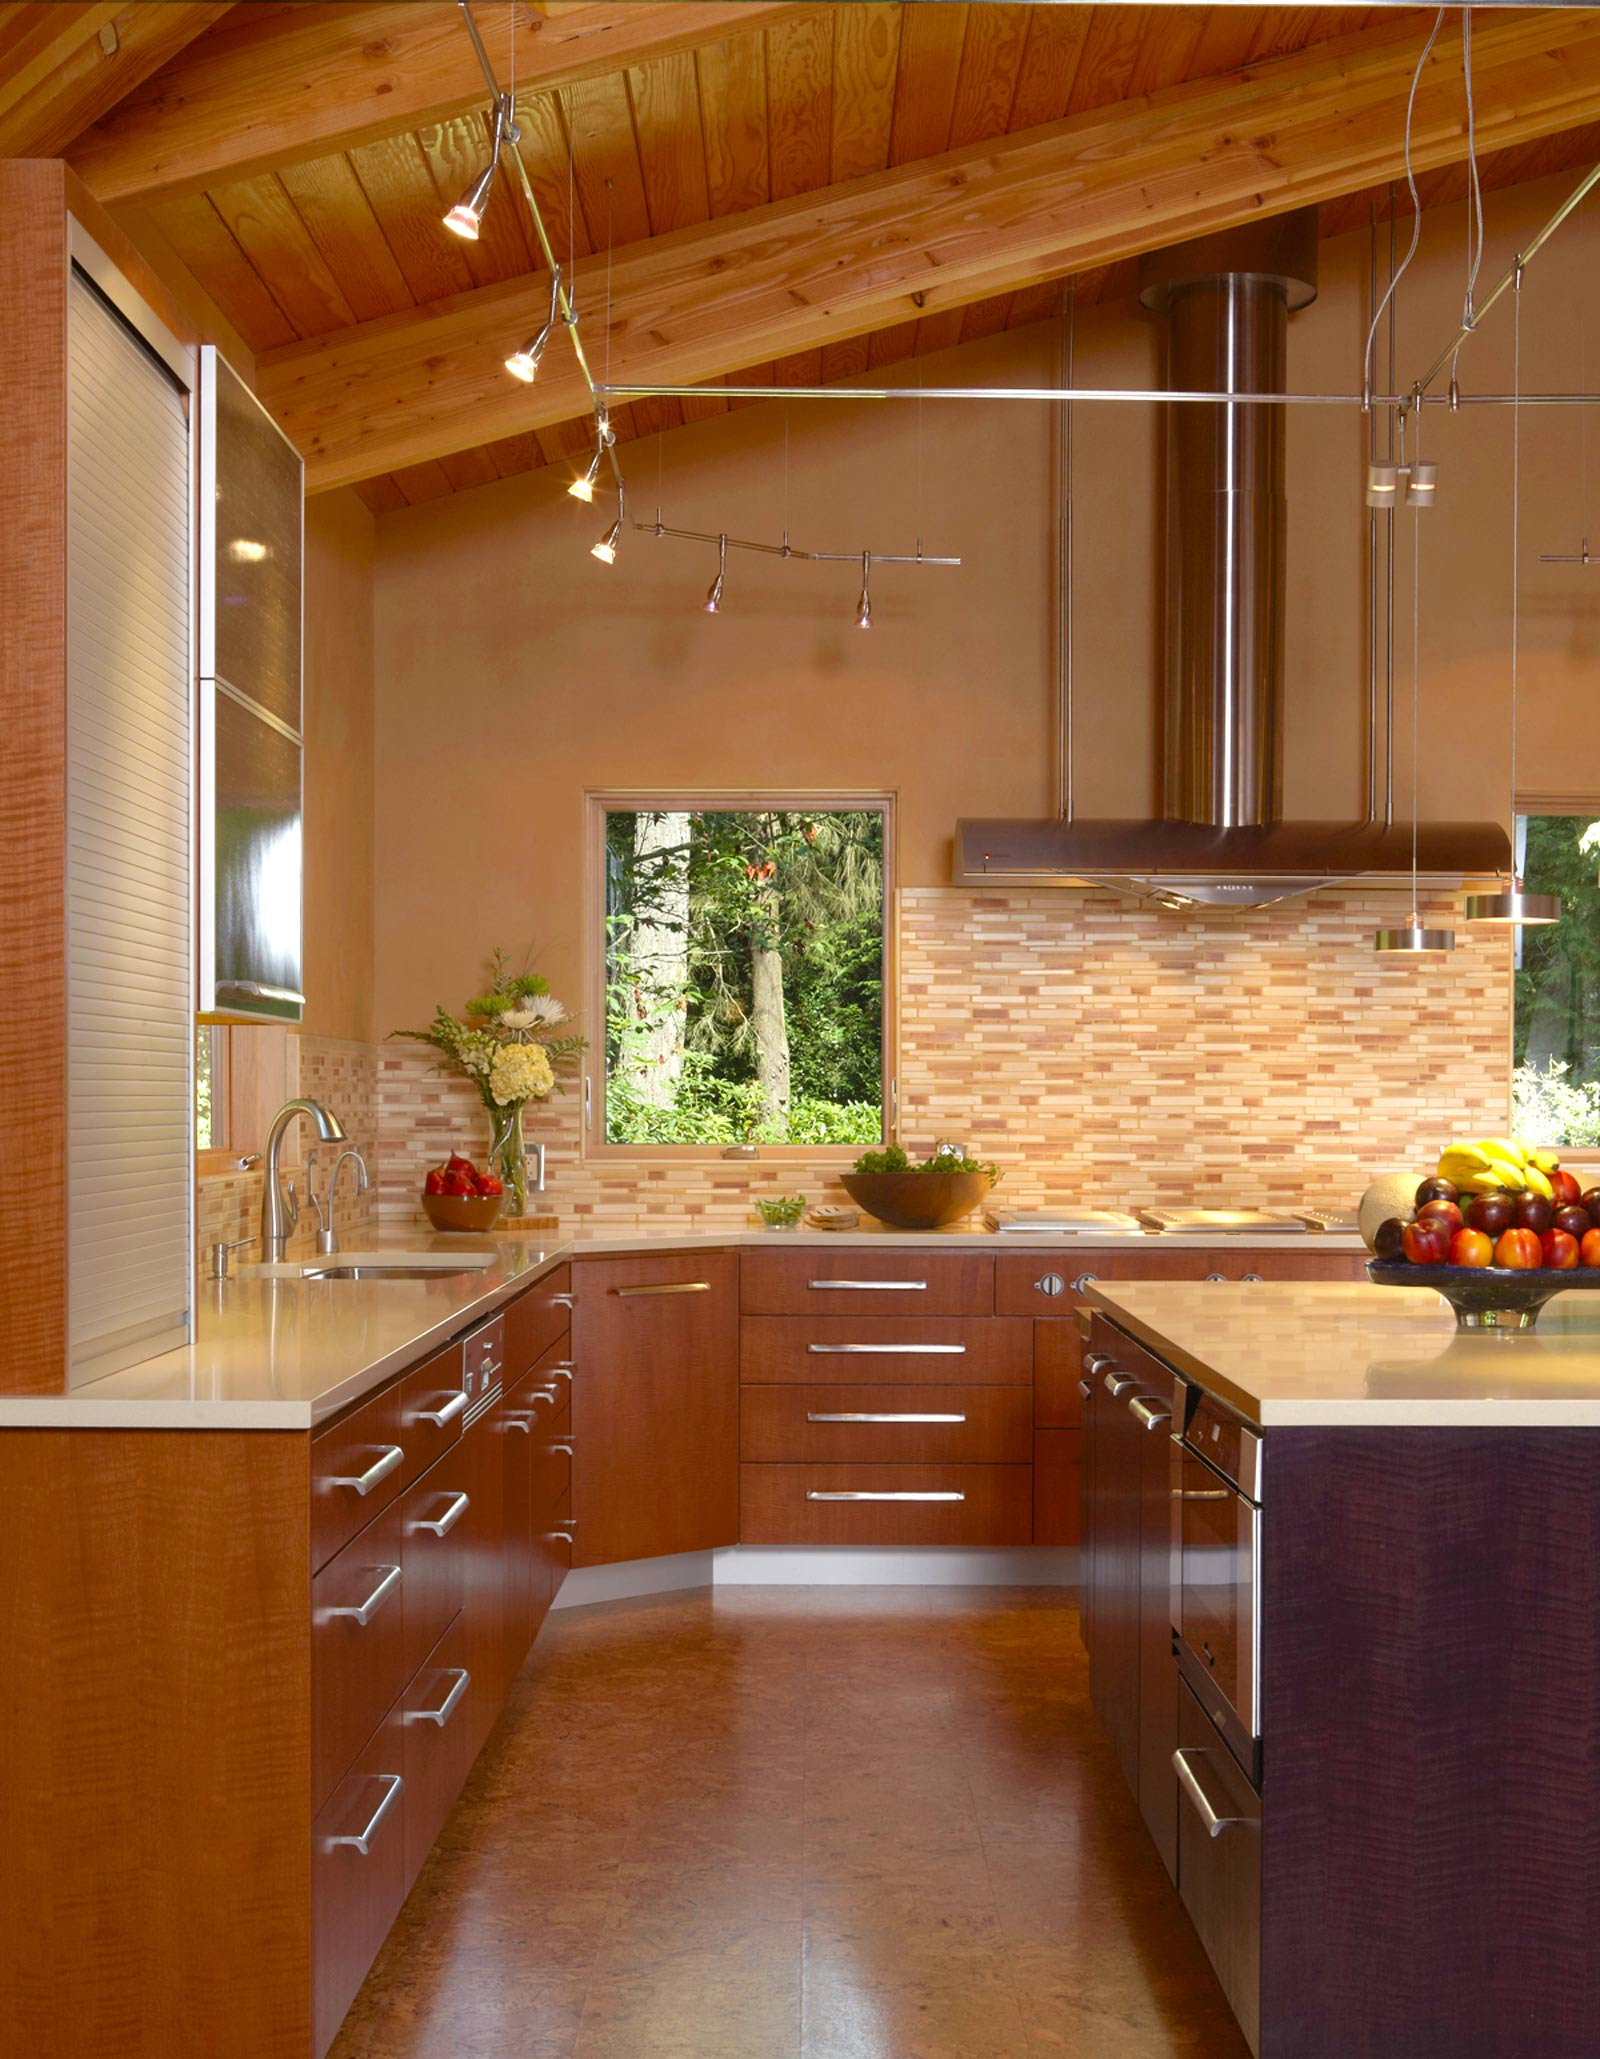 Kitchen remodeling kitsap county 98110 bainbridge island for Anigre kitchen cabinets